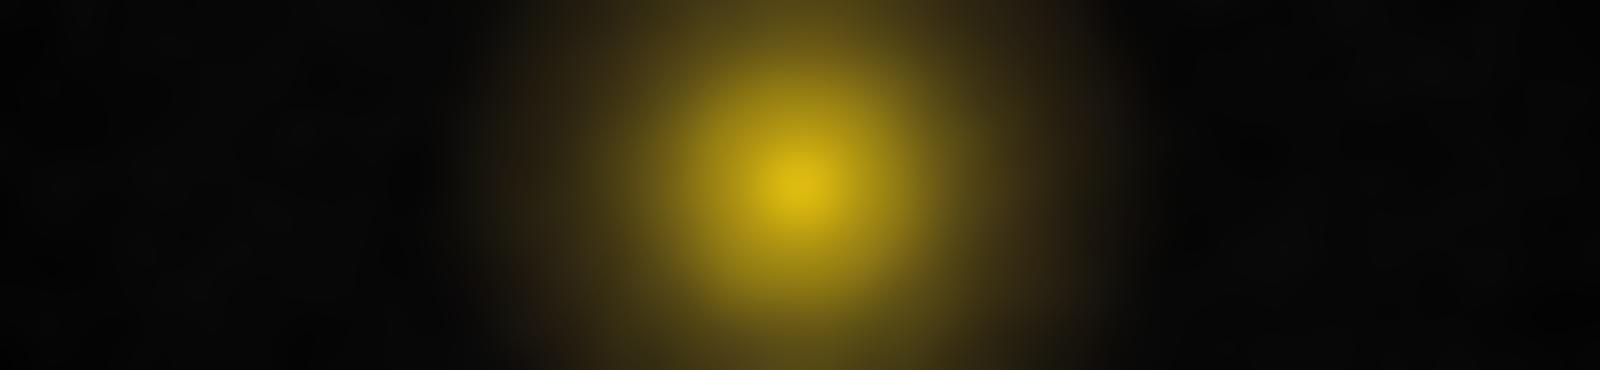 Blurred 87353230 28c3 4b45 9bc5 bd795f3eacc5